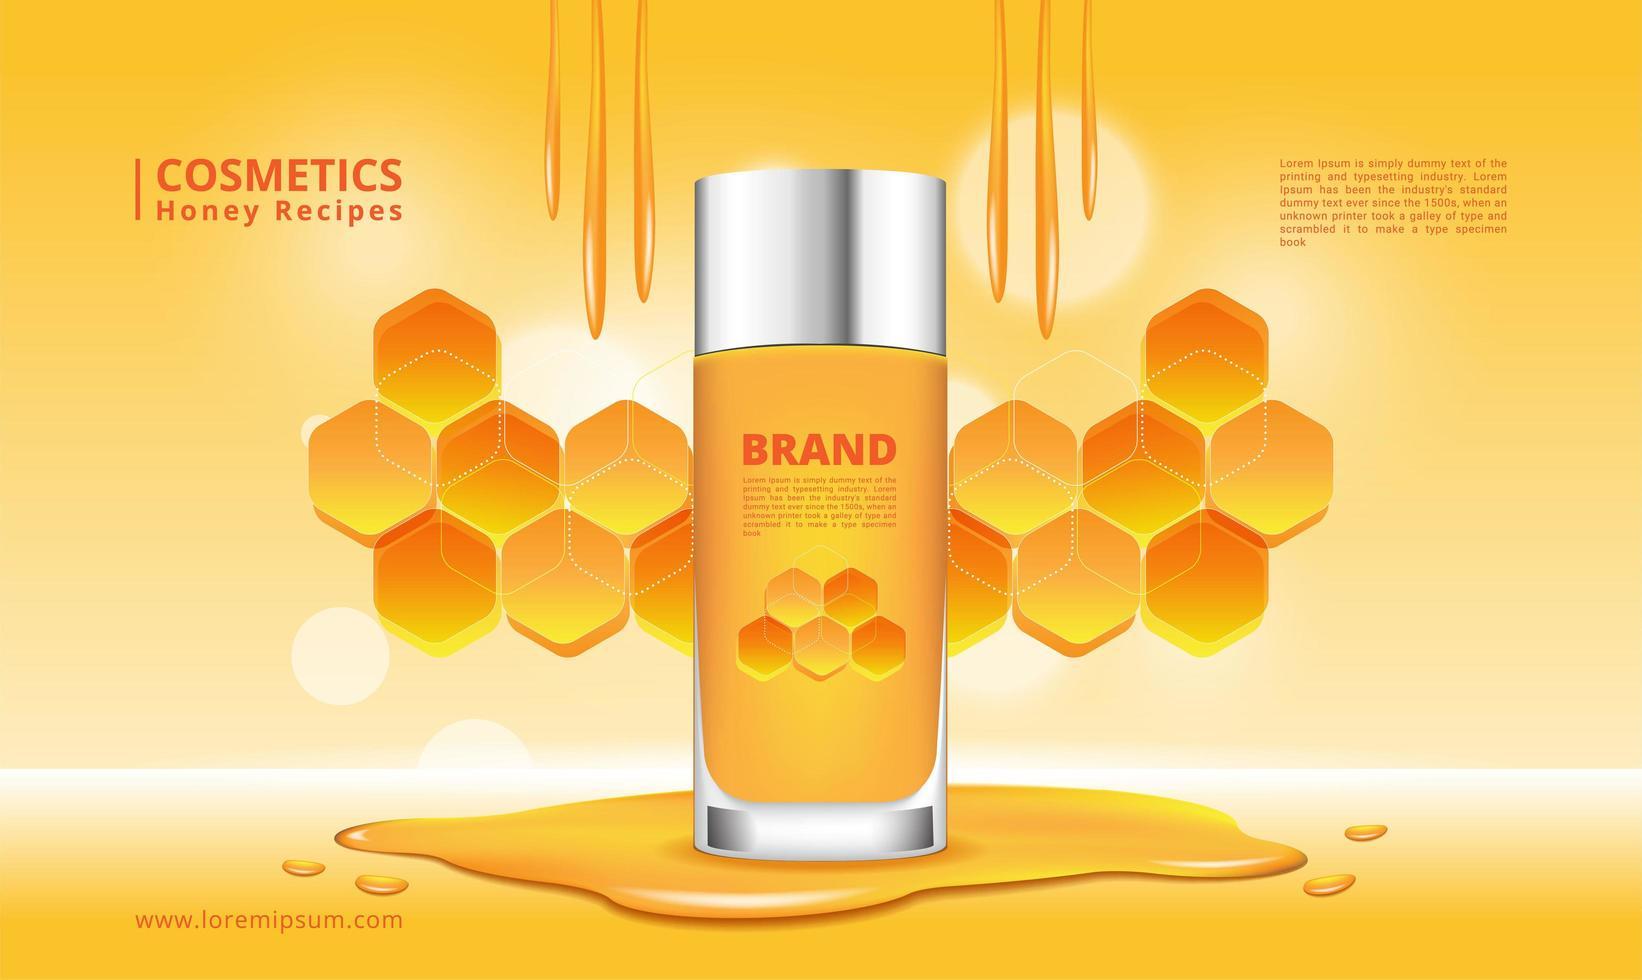 honung kosmetika produkt och honungskaka design vektor